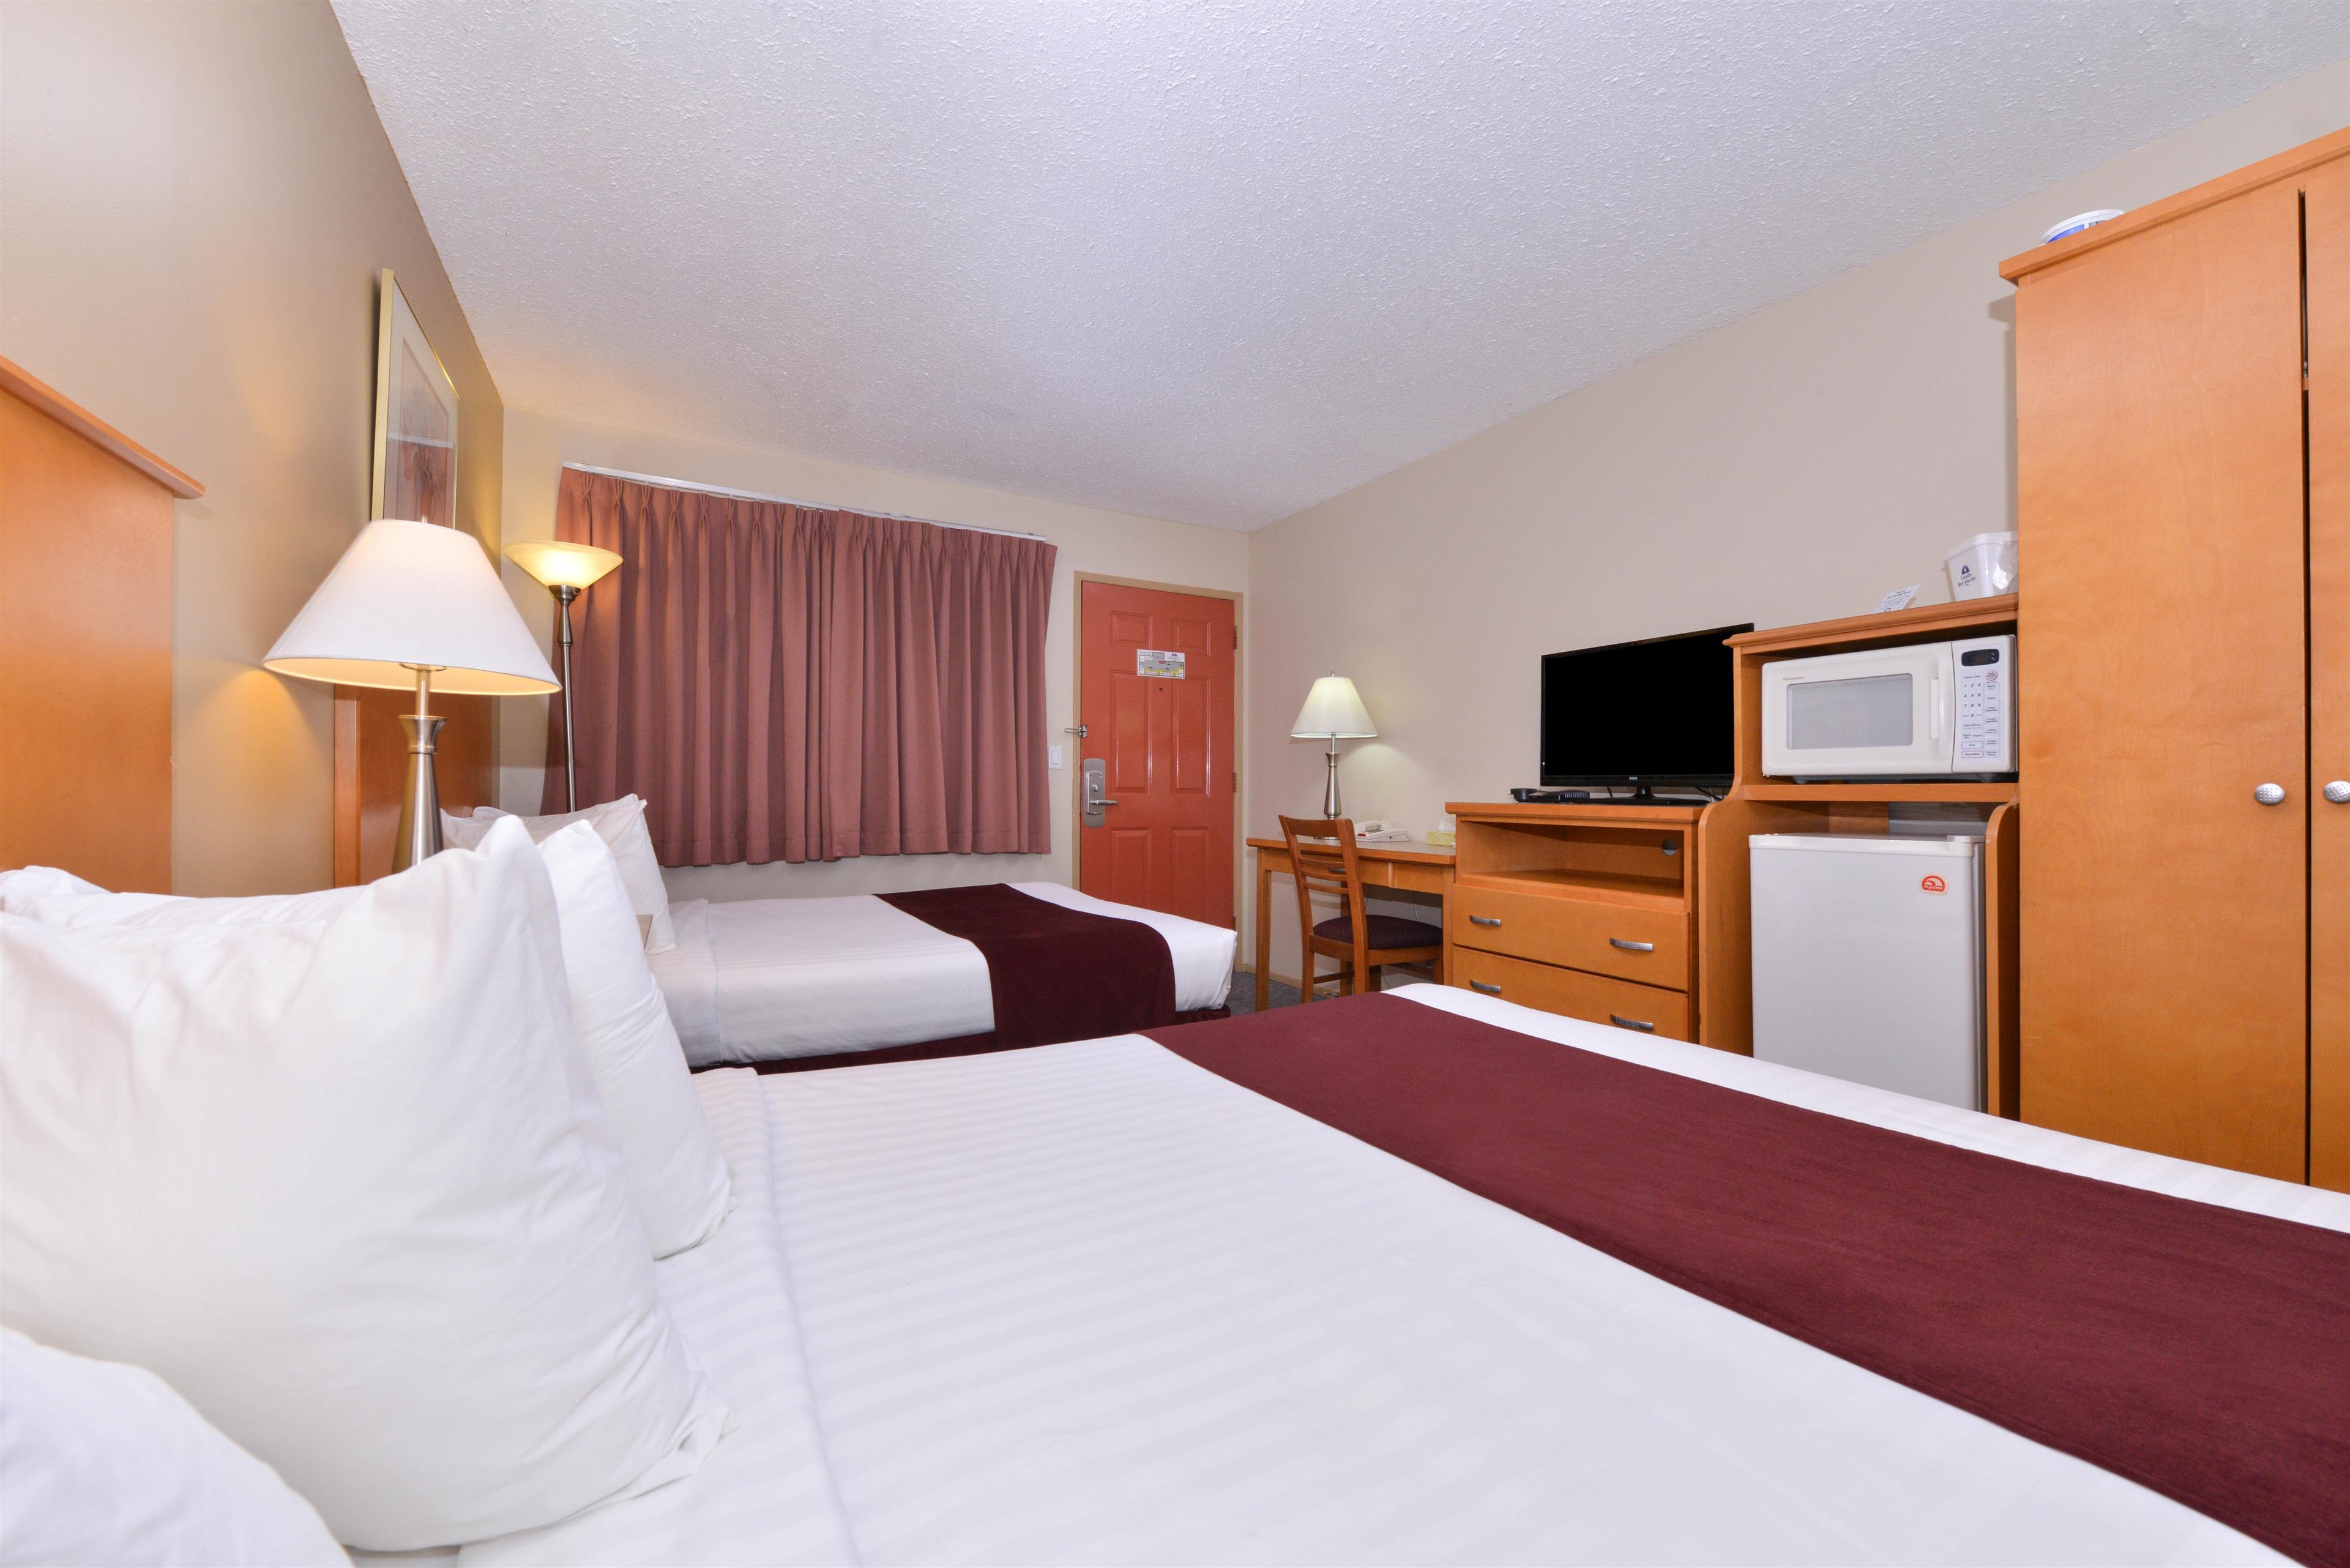 Canadas Best Value Inn & Suites in Vernon: Two Queen Beds